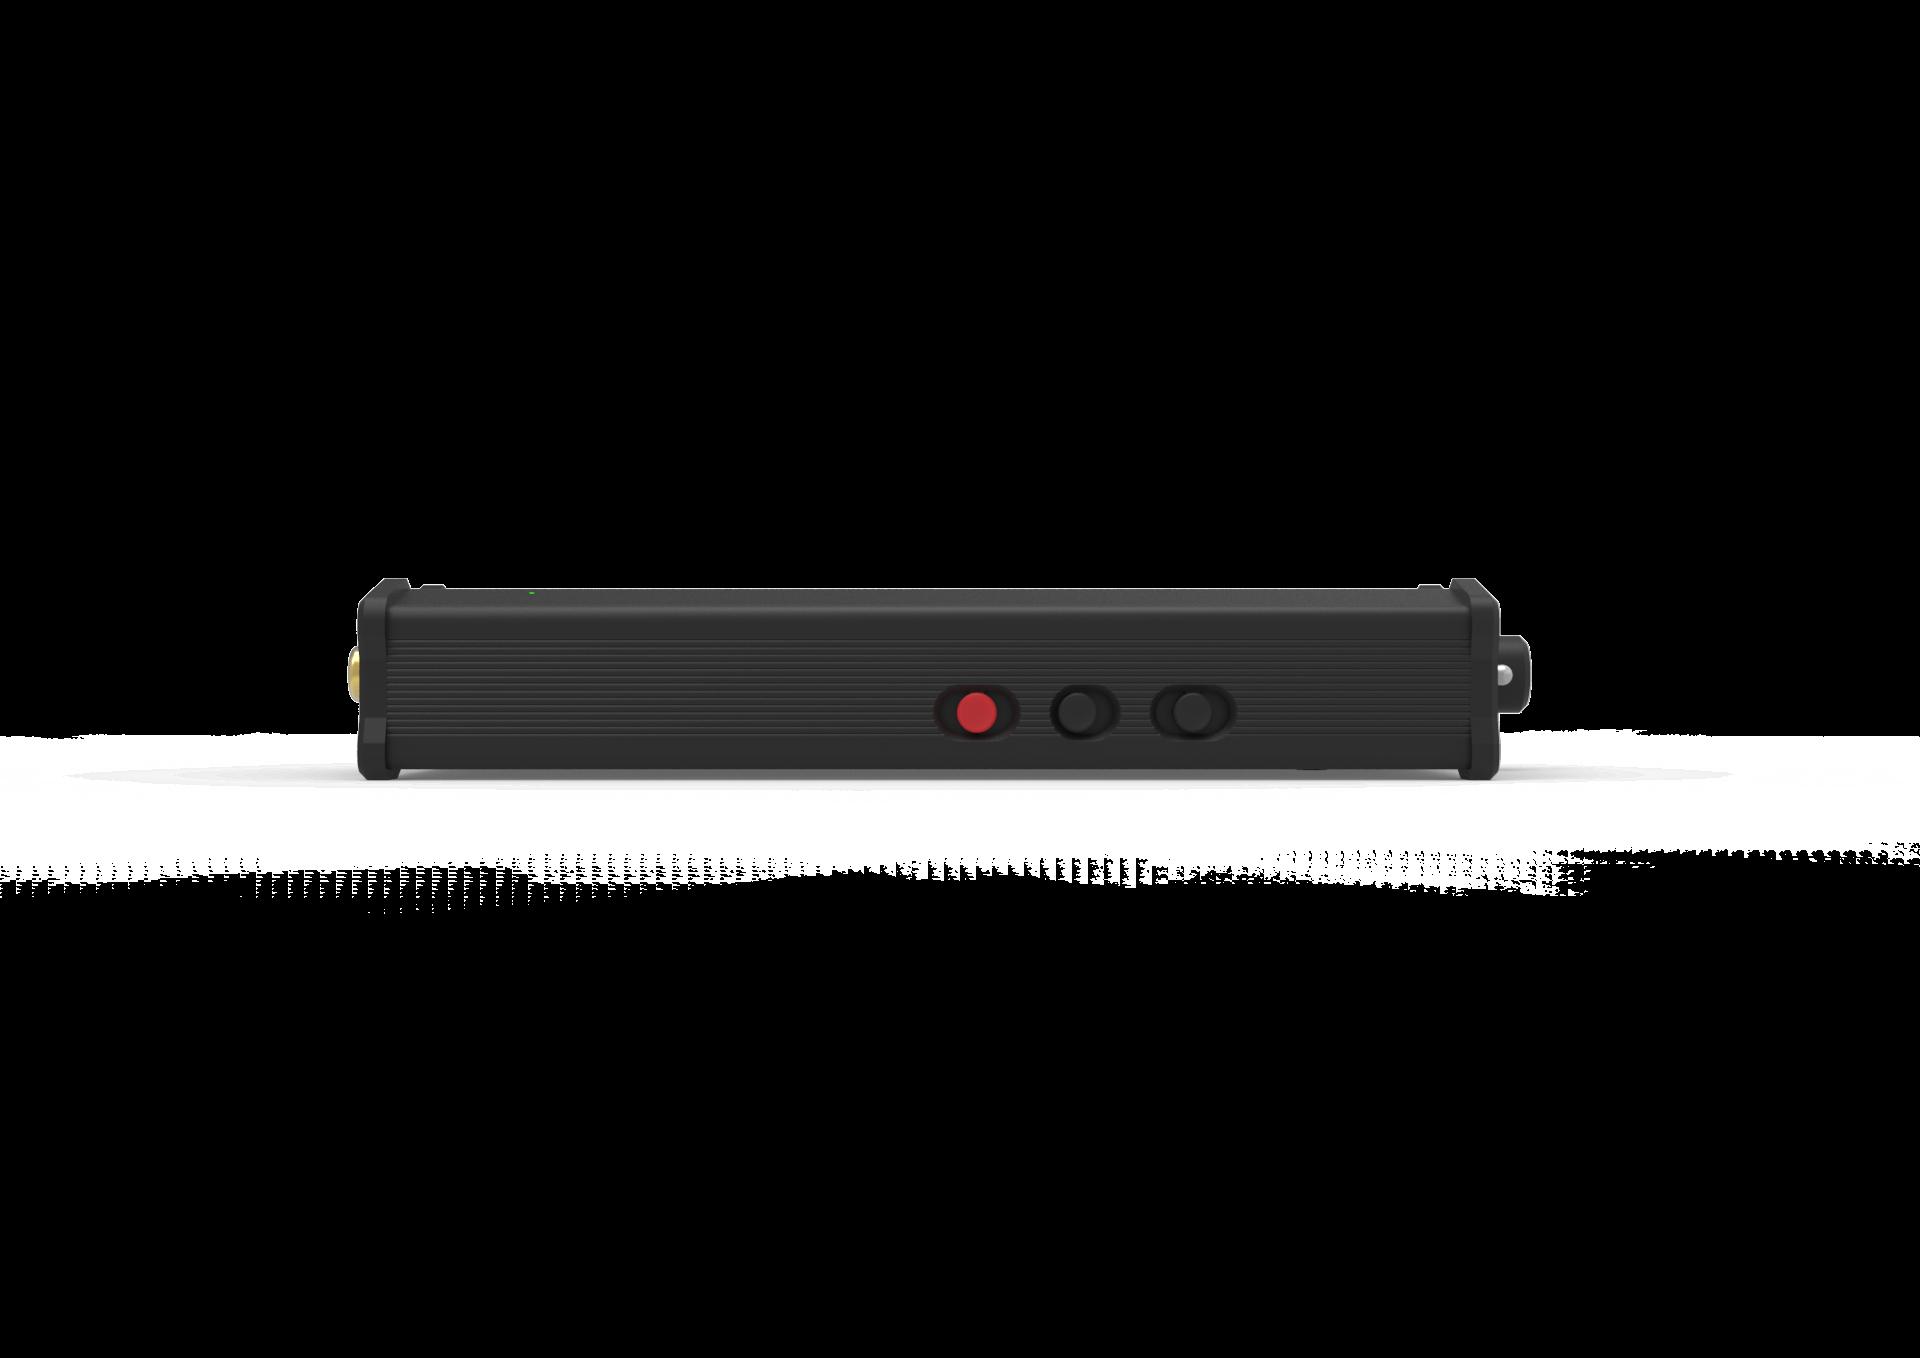 audiow3 ifi audio micro idsd black label dac headphone amp. Black Bedroom Furniture Sets. Home Design Ideas